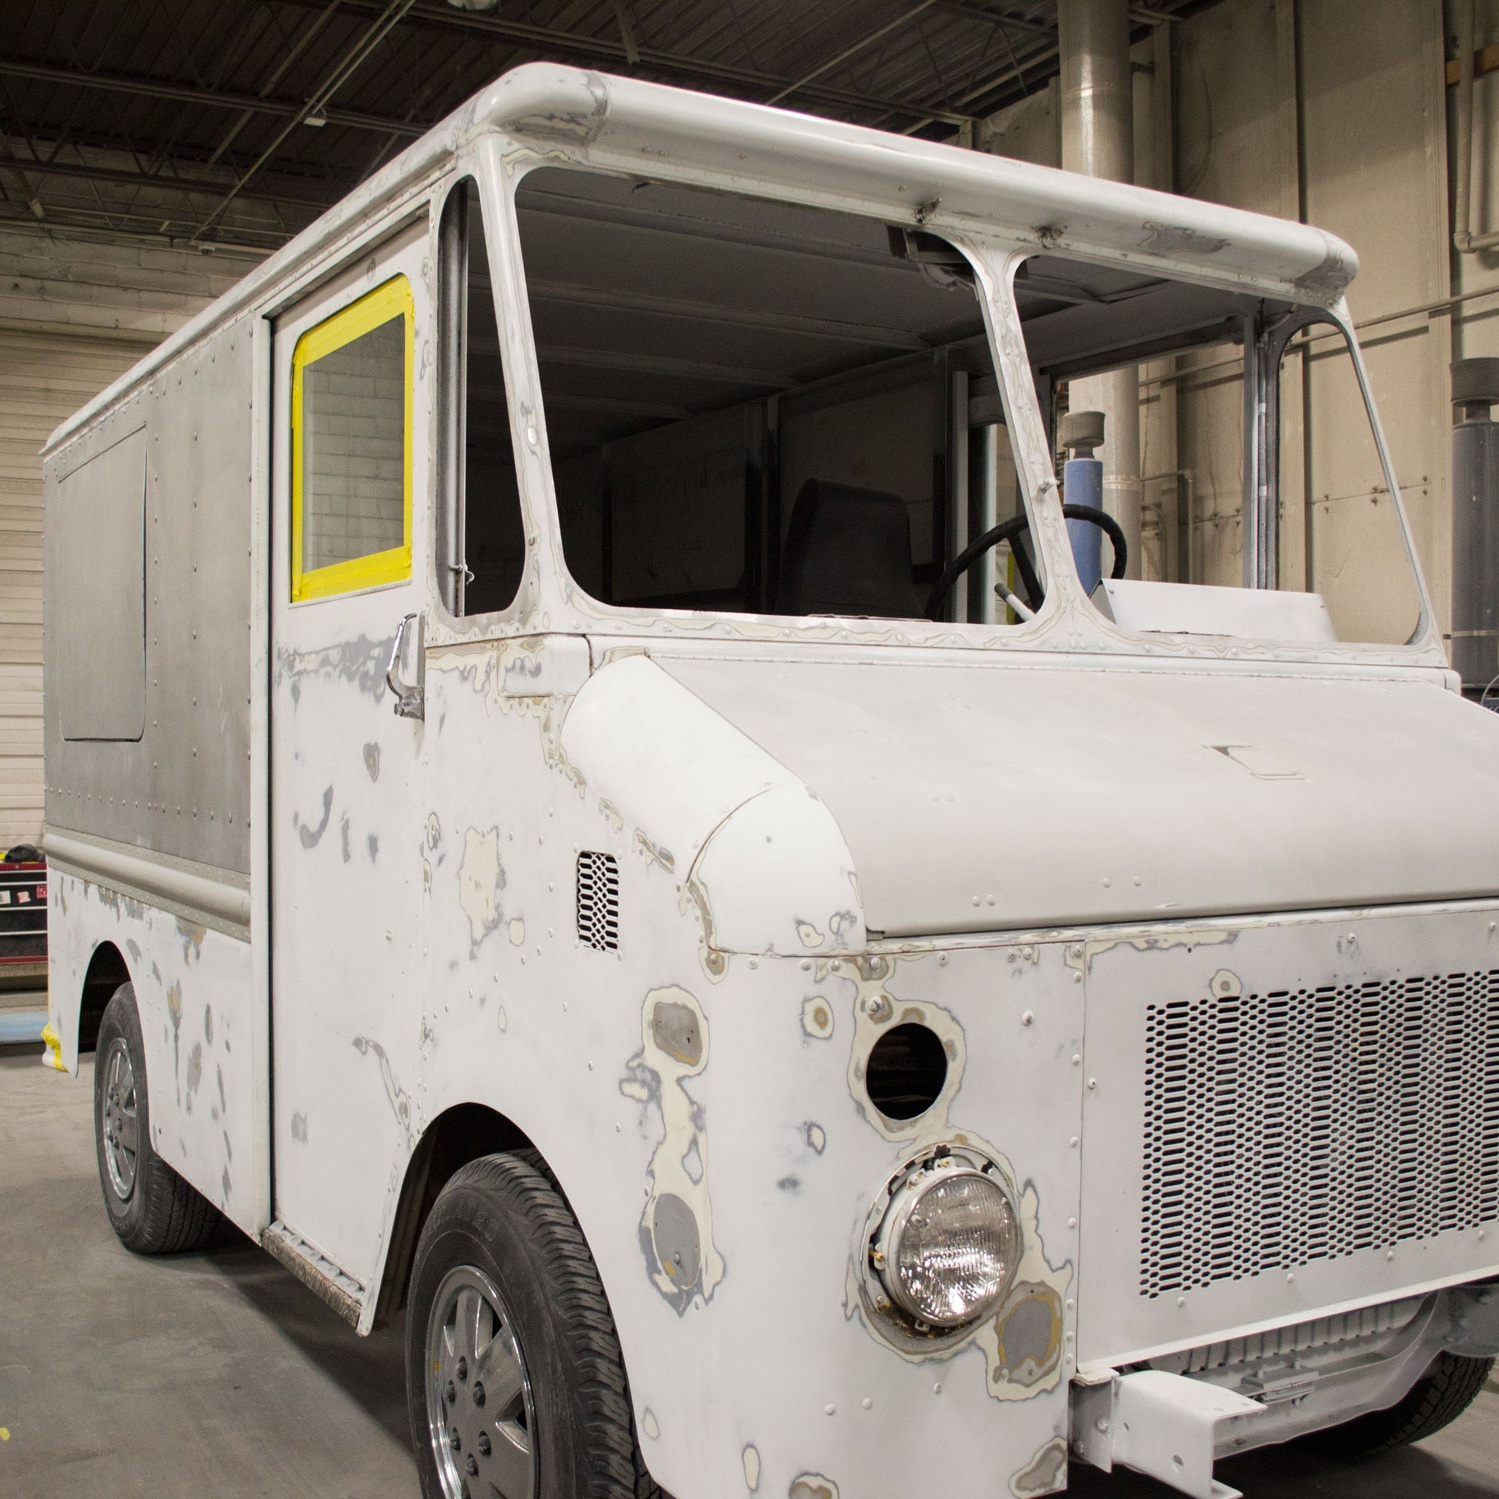 APR18_TruckPaint4.jpg